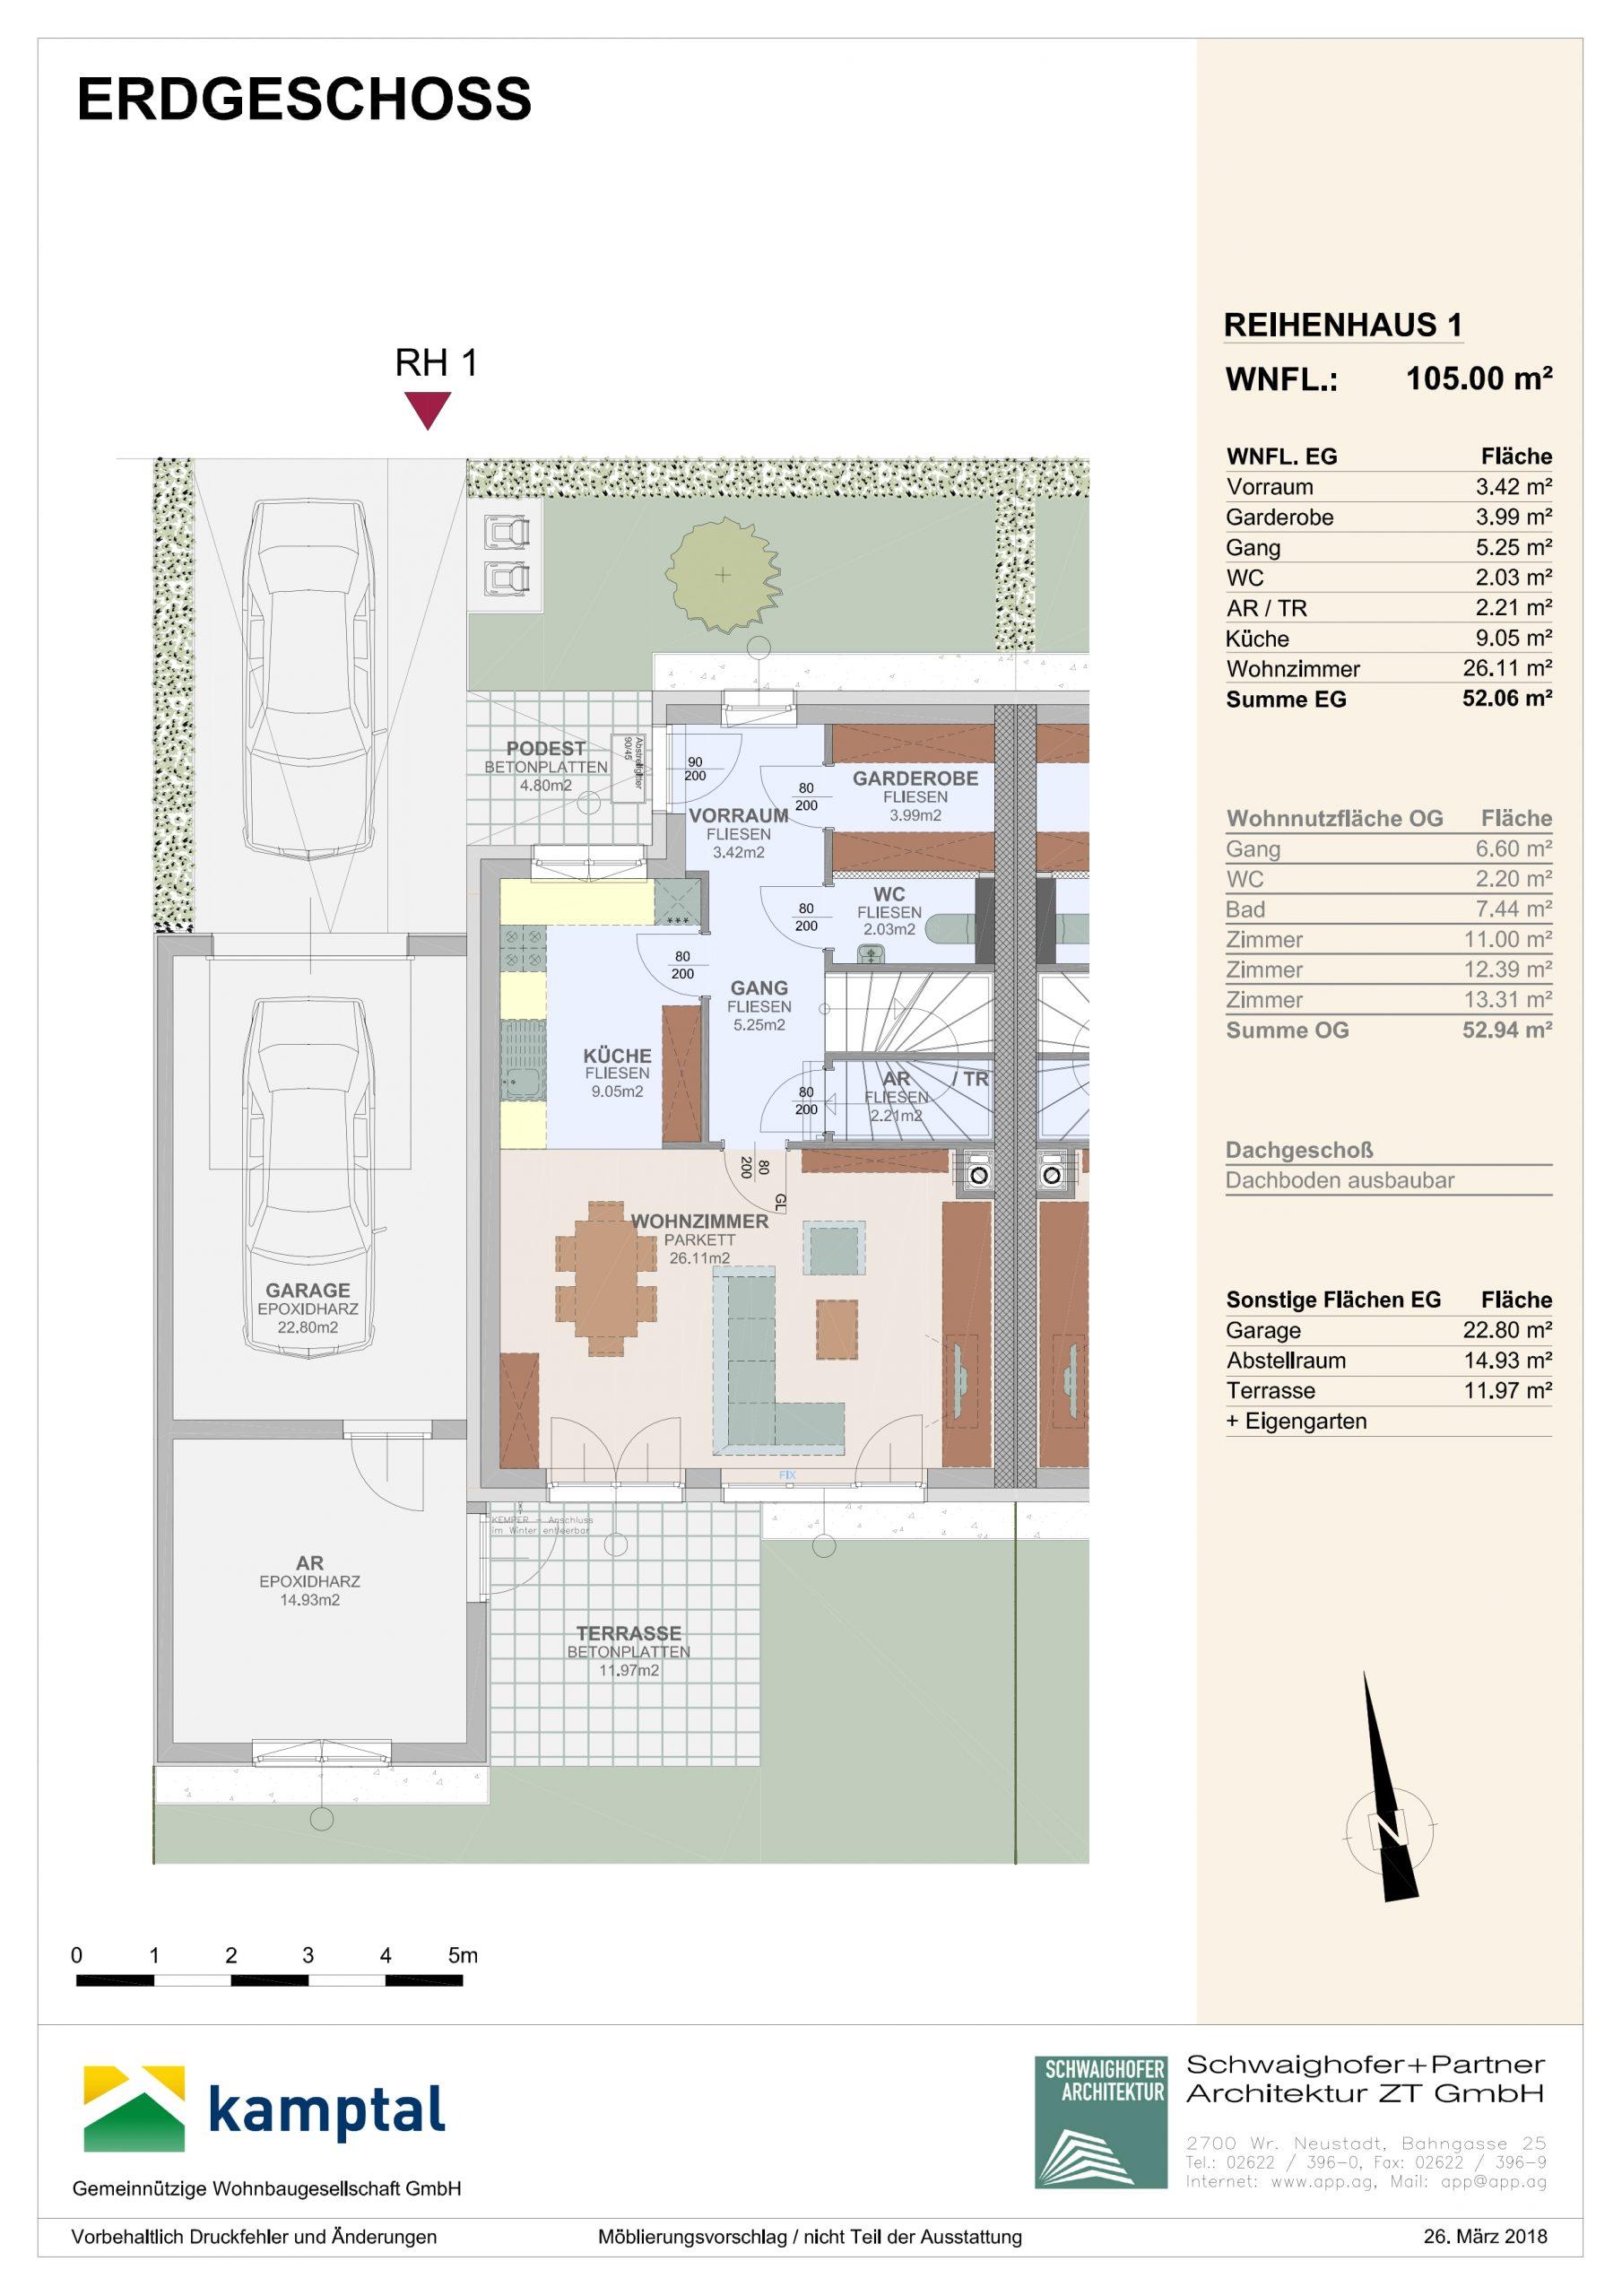 Immobilie von Kamptal in 2136 Laa an der Thaya, Mistelbach, Laa/Thaya XVIII - Top 7 #0